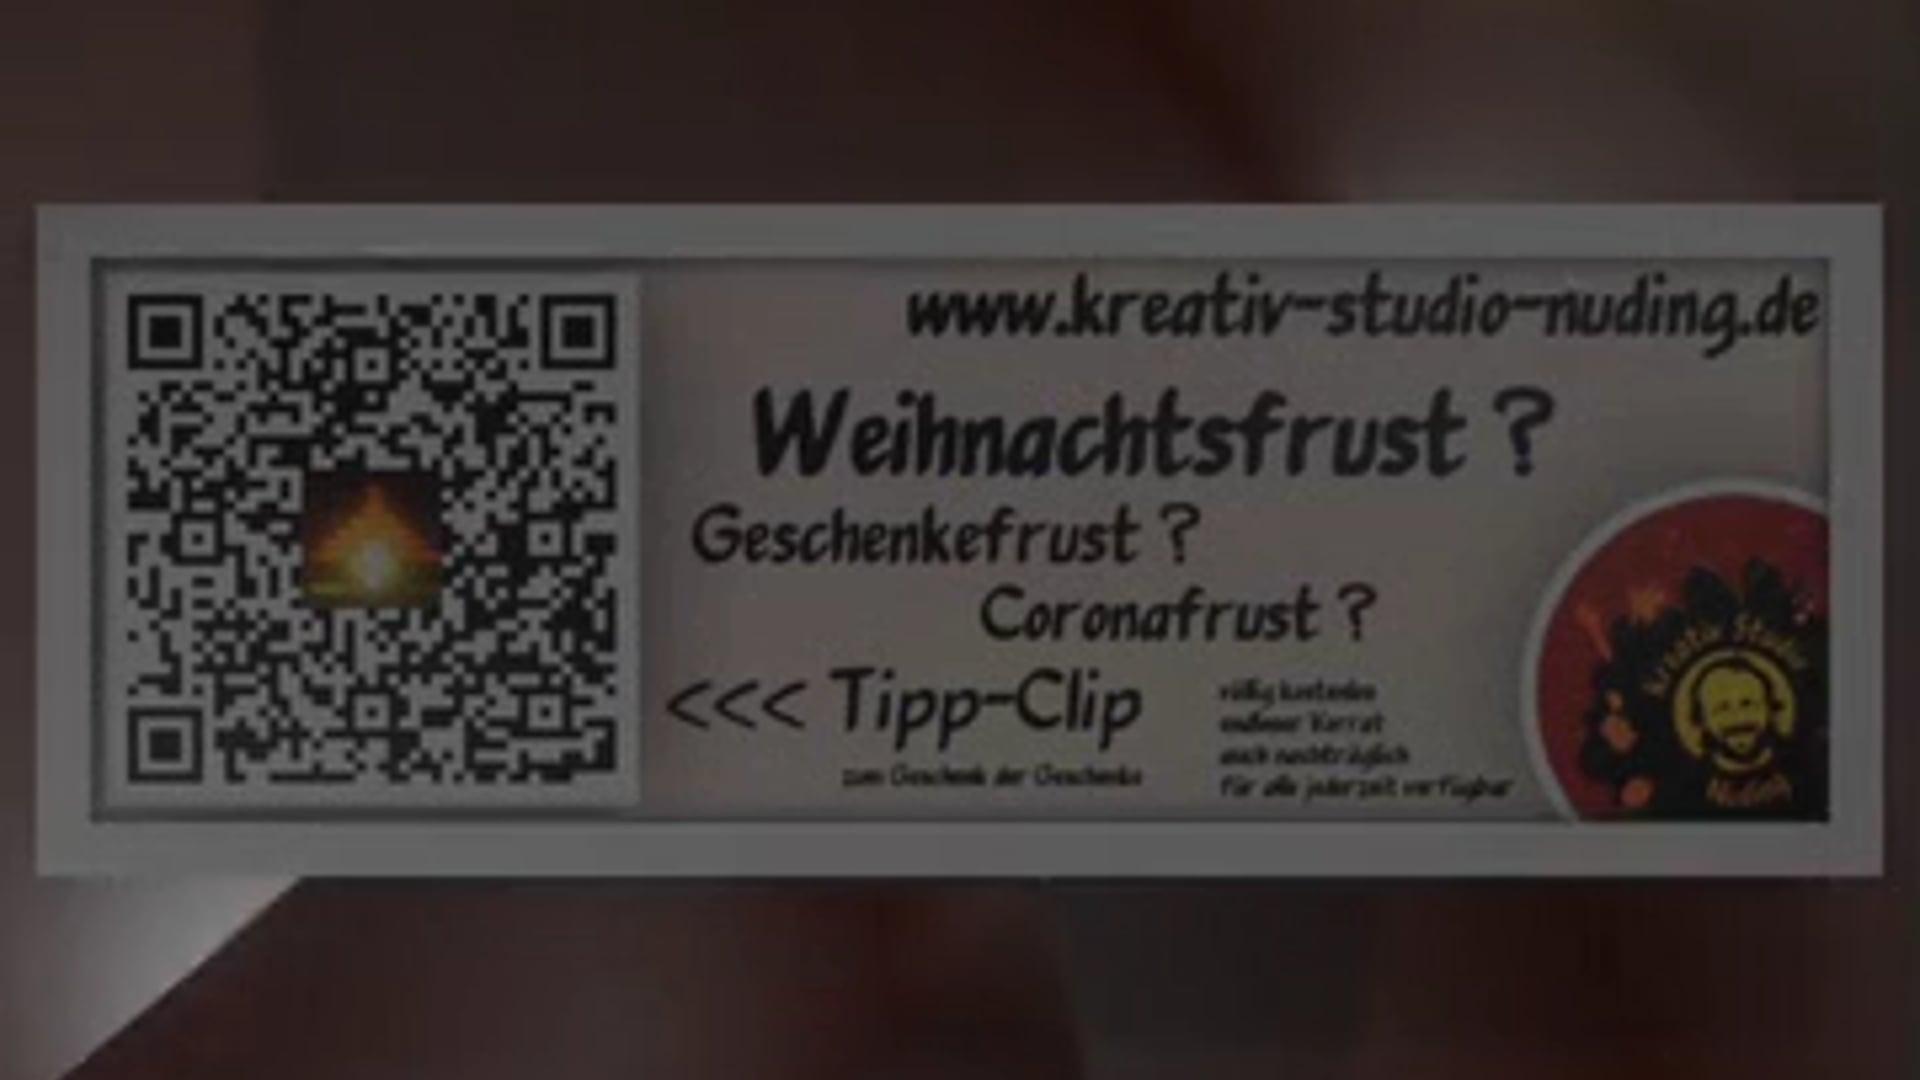 2021-01-22-PinClip-Frust-ade-Kreativ-Studio-Nuding